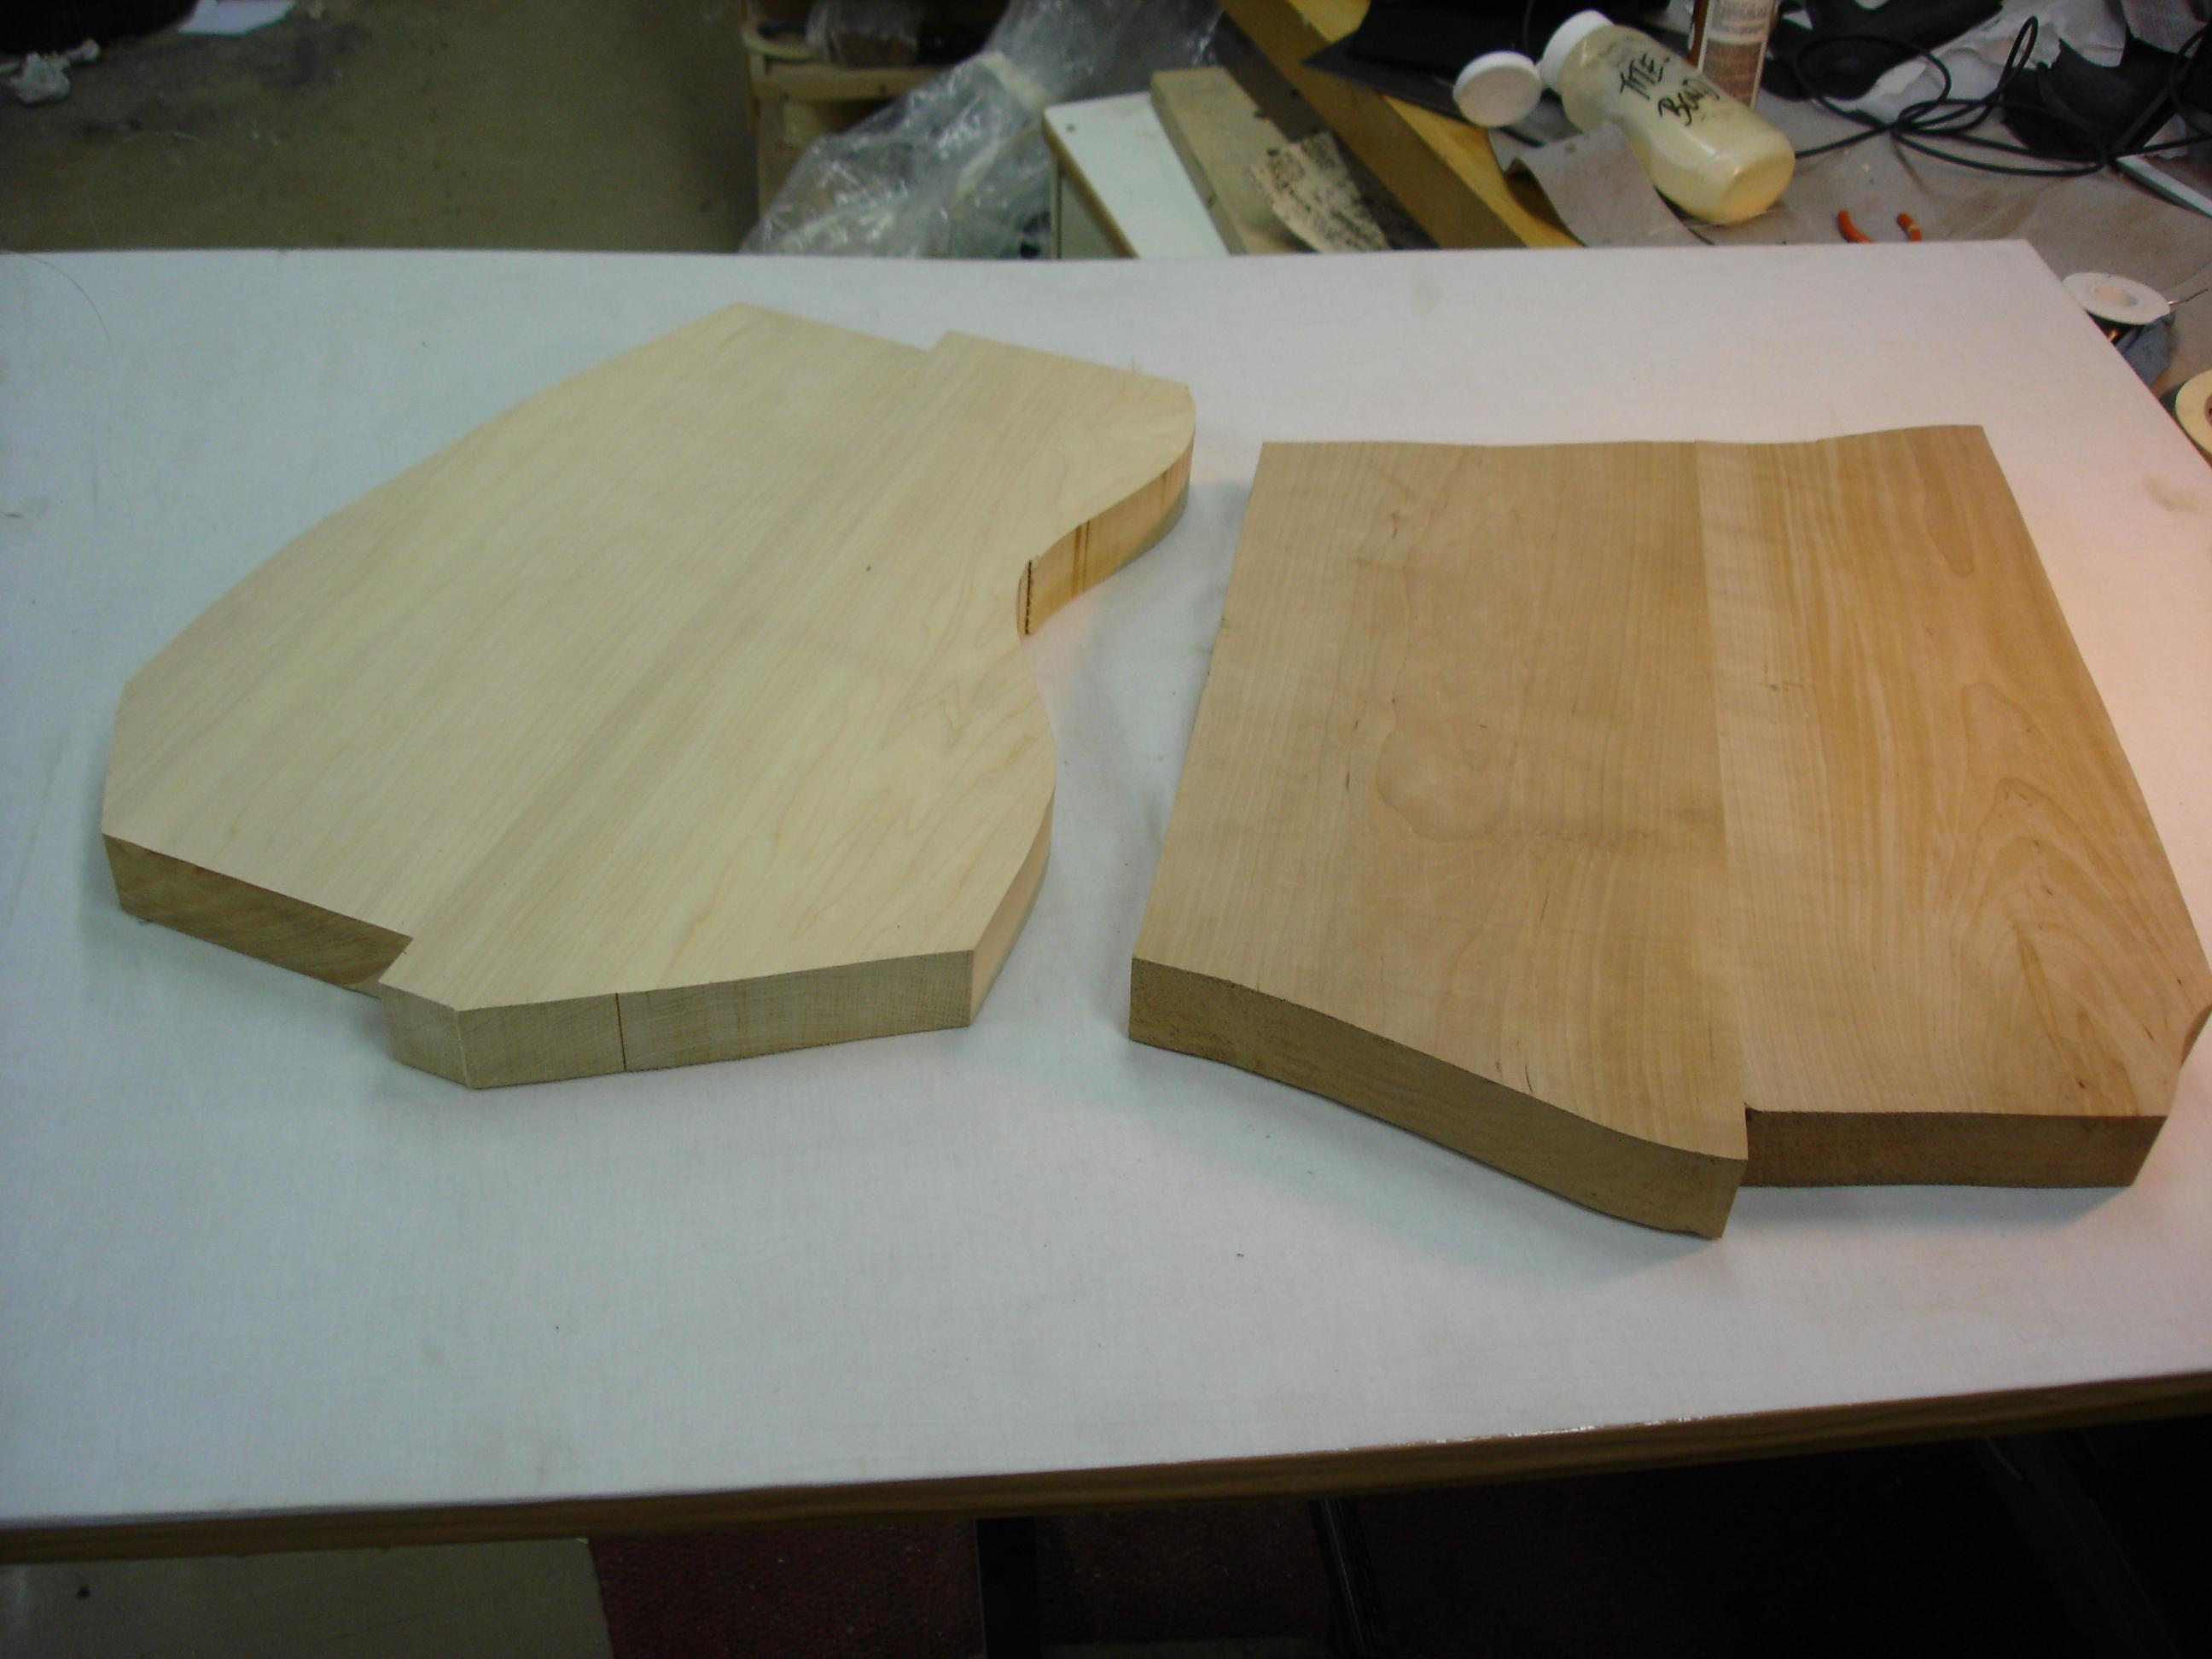 Thermo Treated Wood - Juha Ruokangas